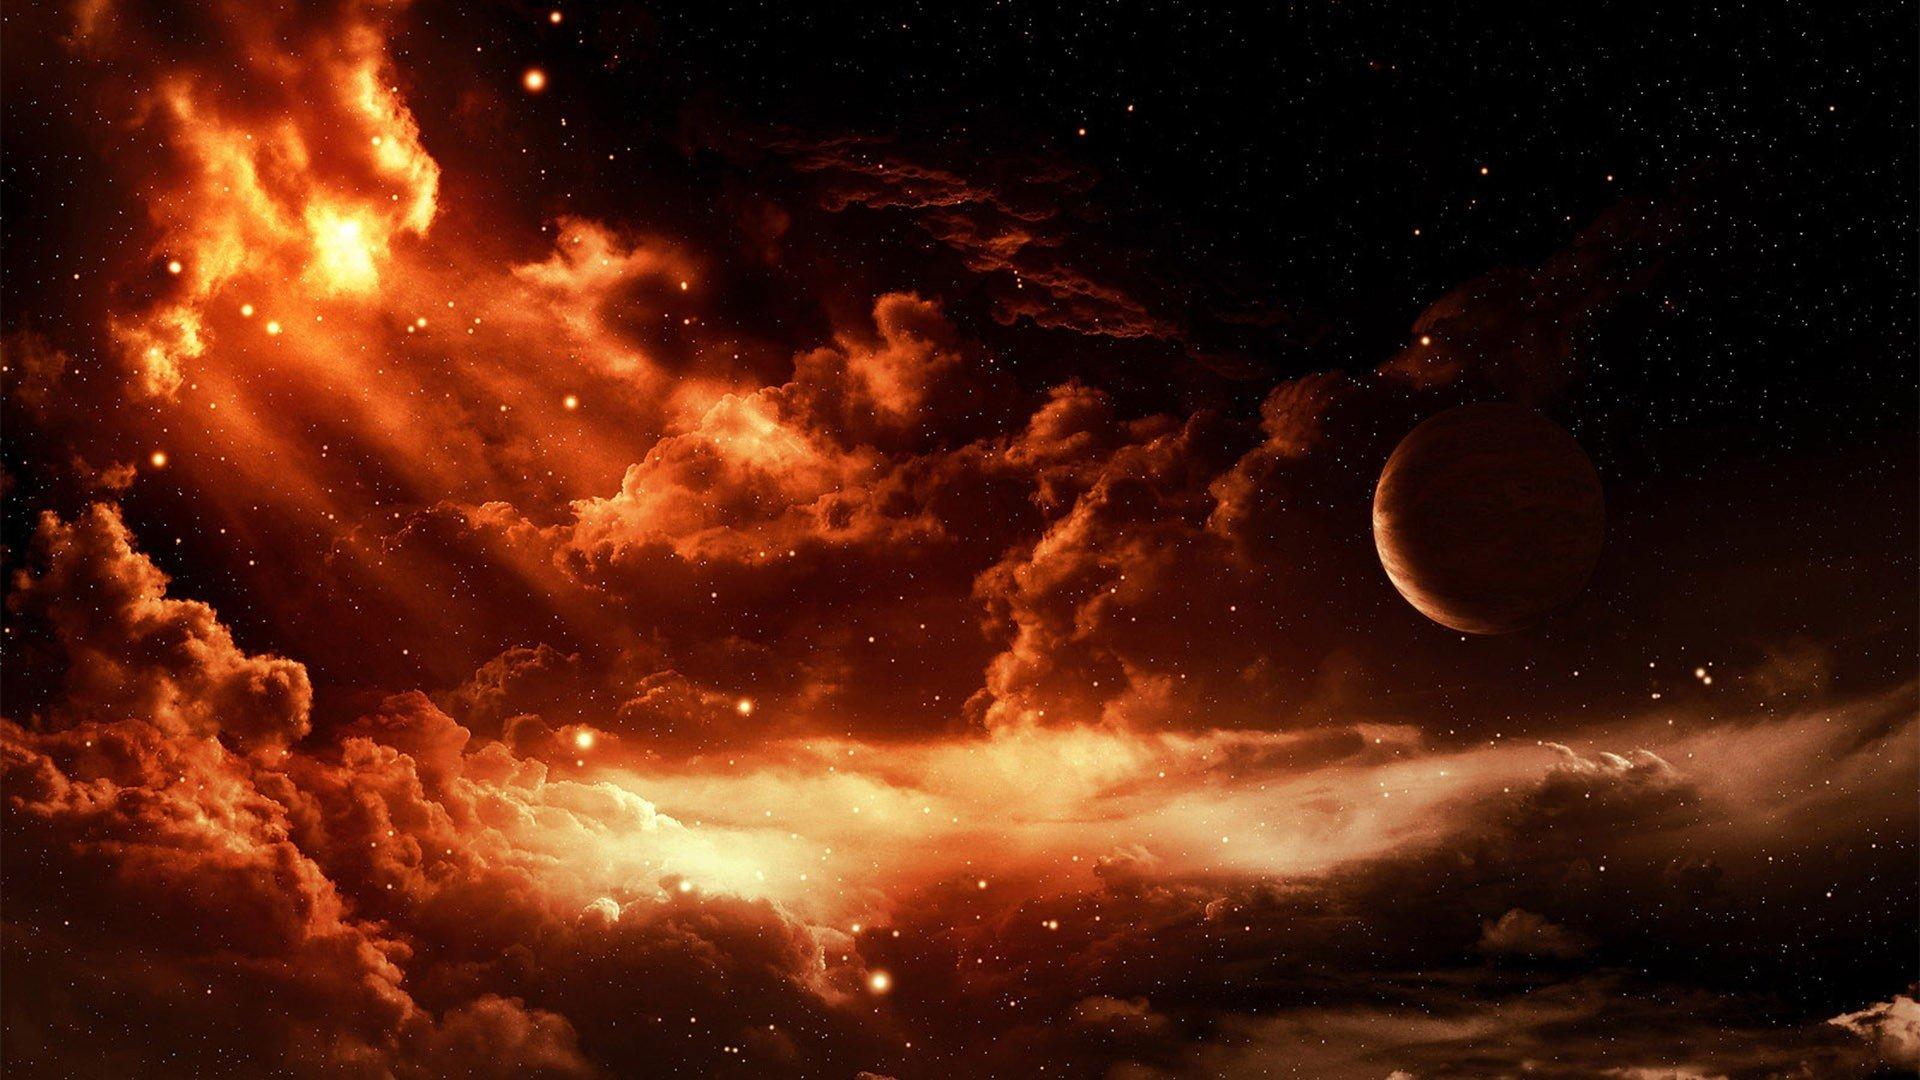 Desktop Wallpaper Hd 3d Full Screen God Red Moon Wallpaper Hd Pixelstalk Net